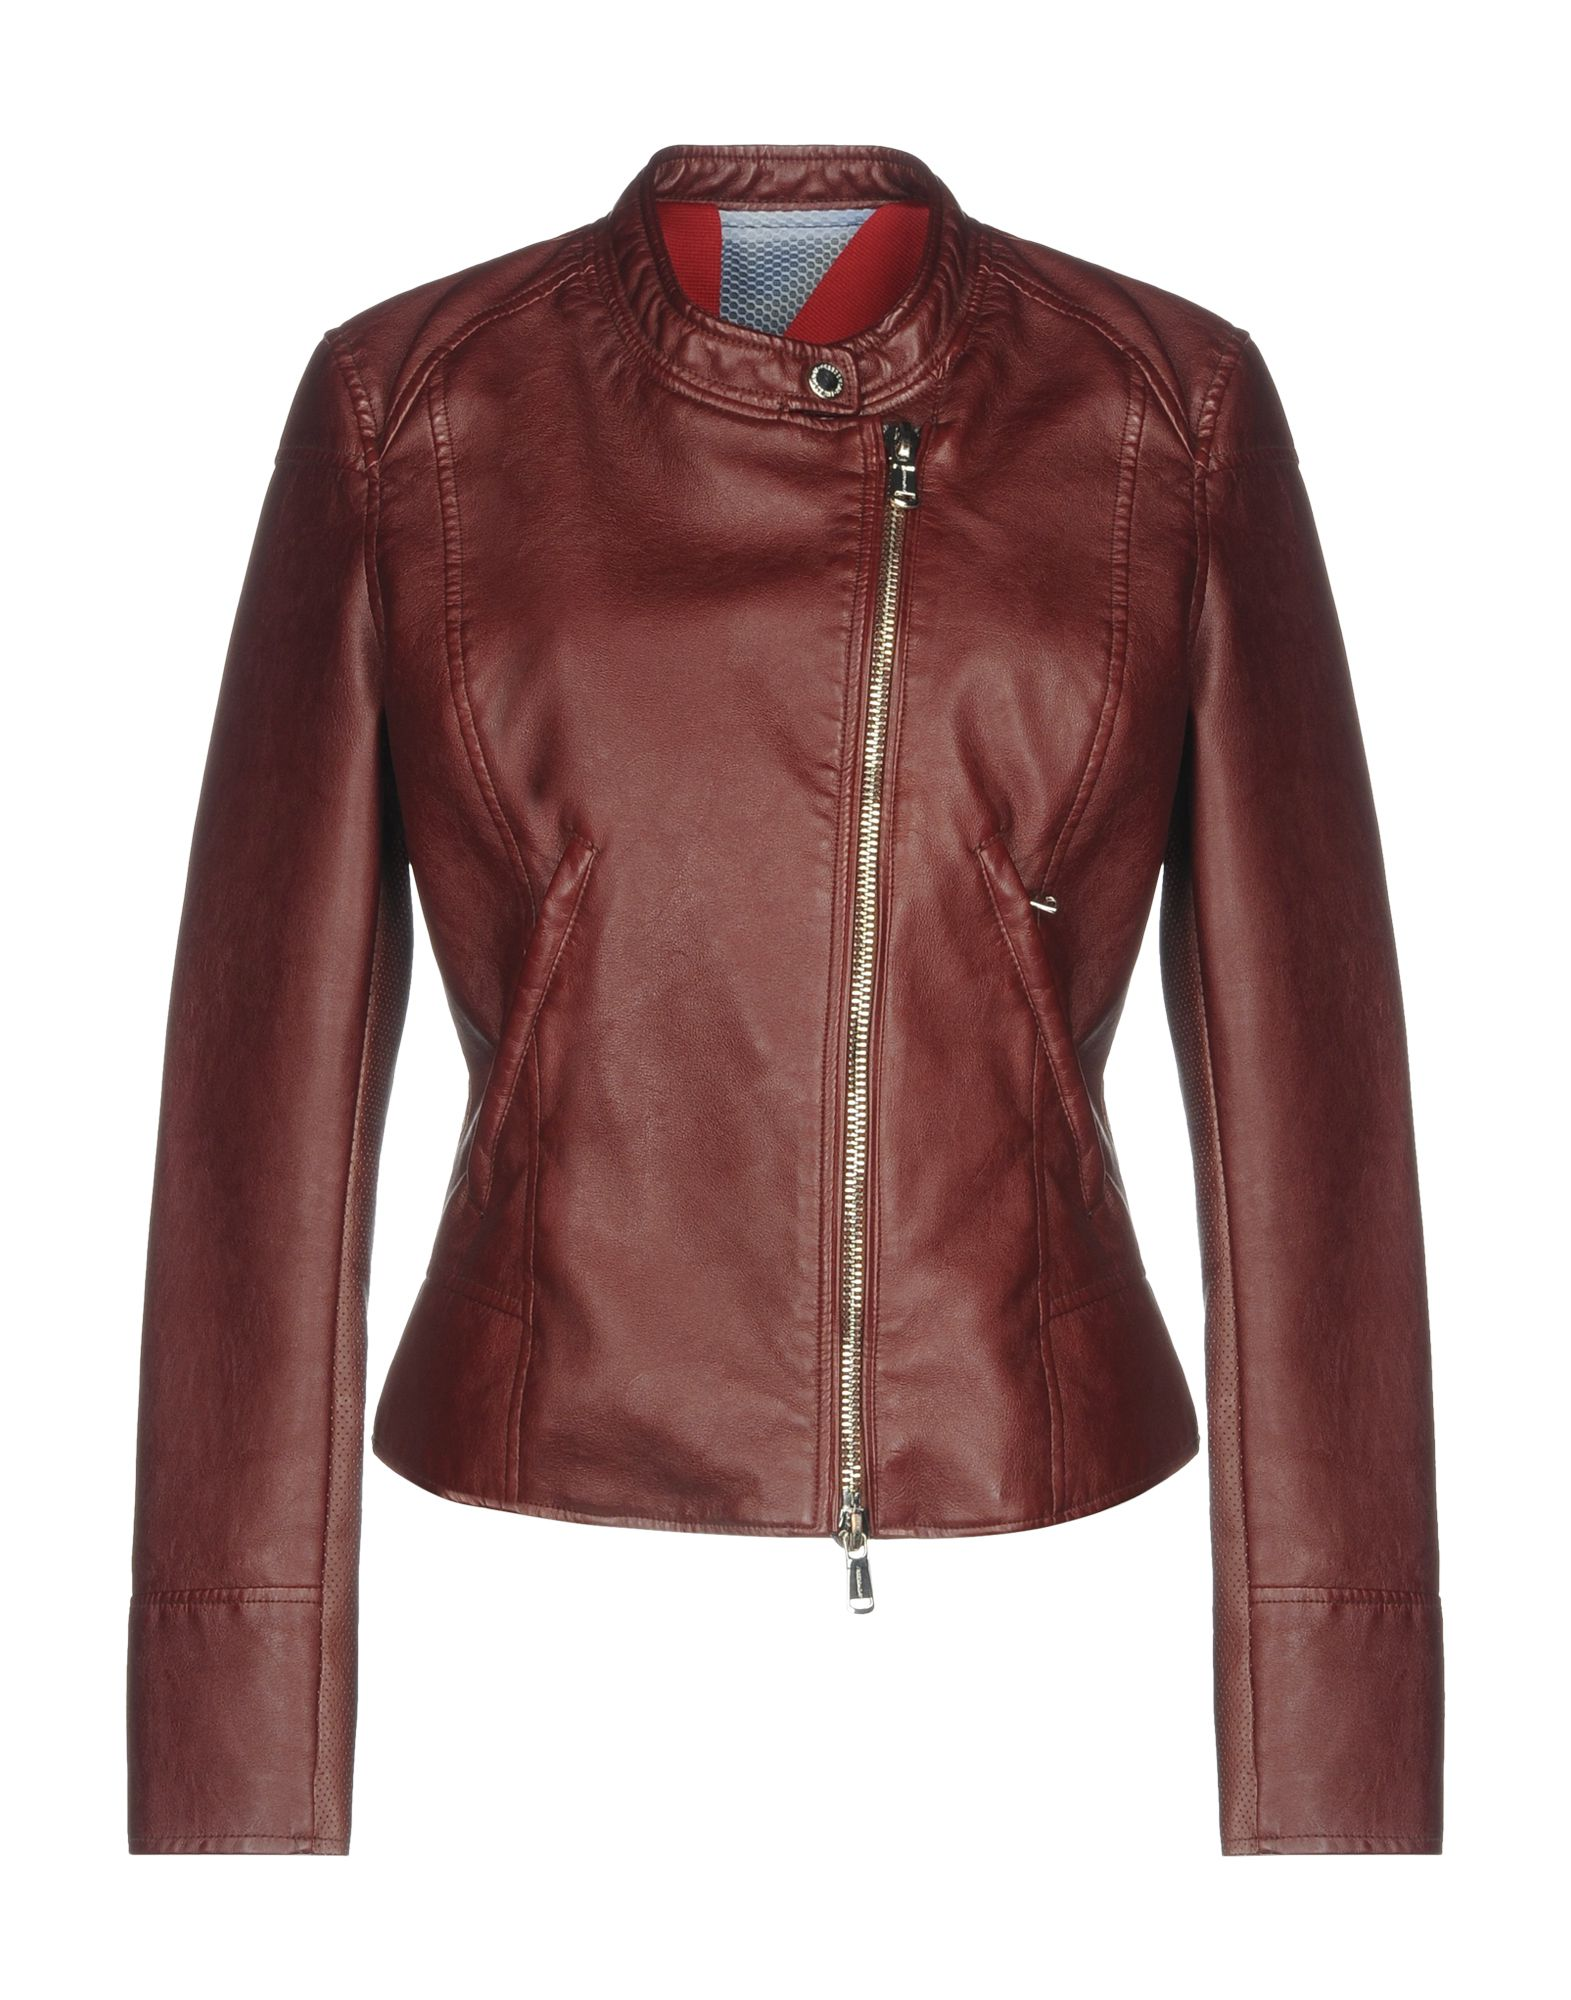 FREEDOMDAY Куртка двуцетная кожаная куртка косуха на молнии